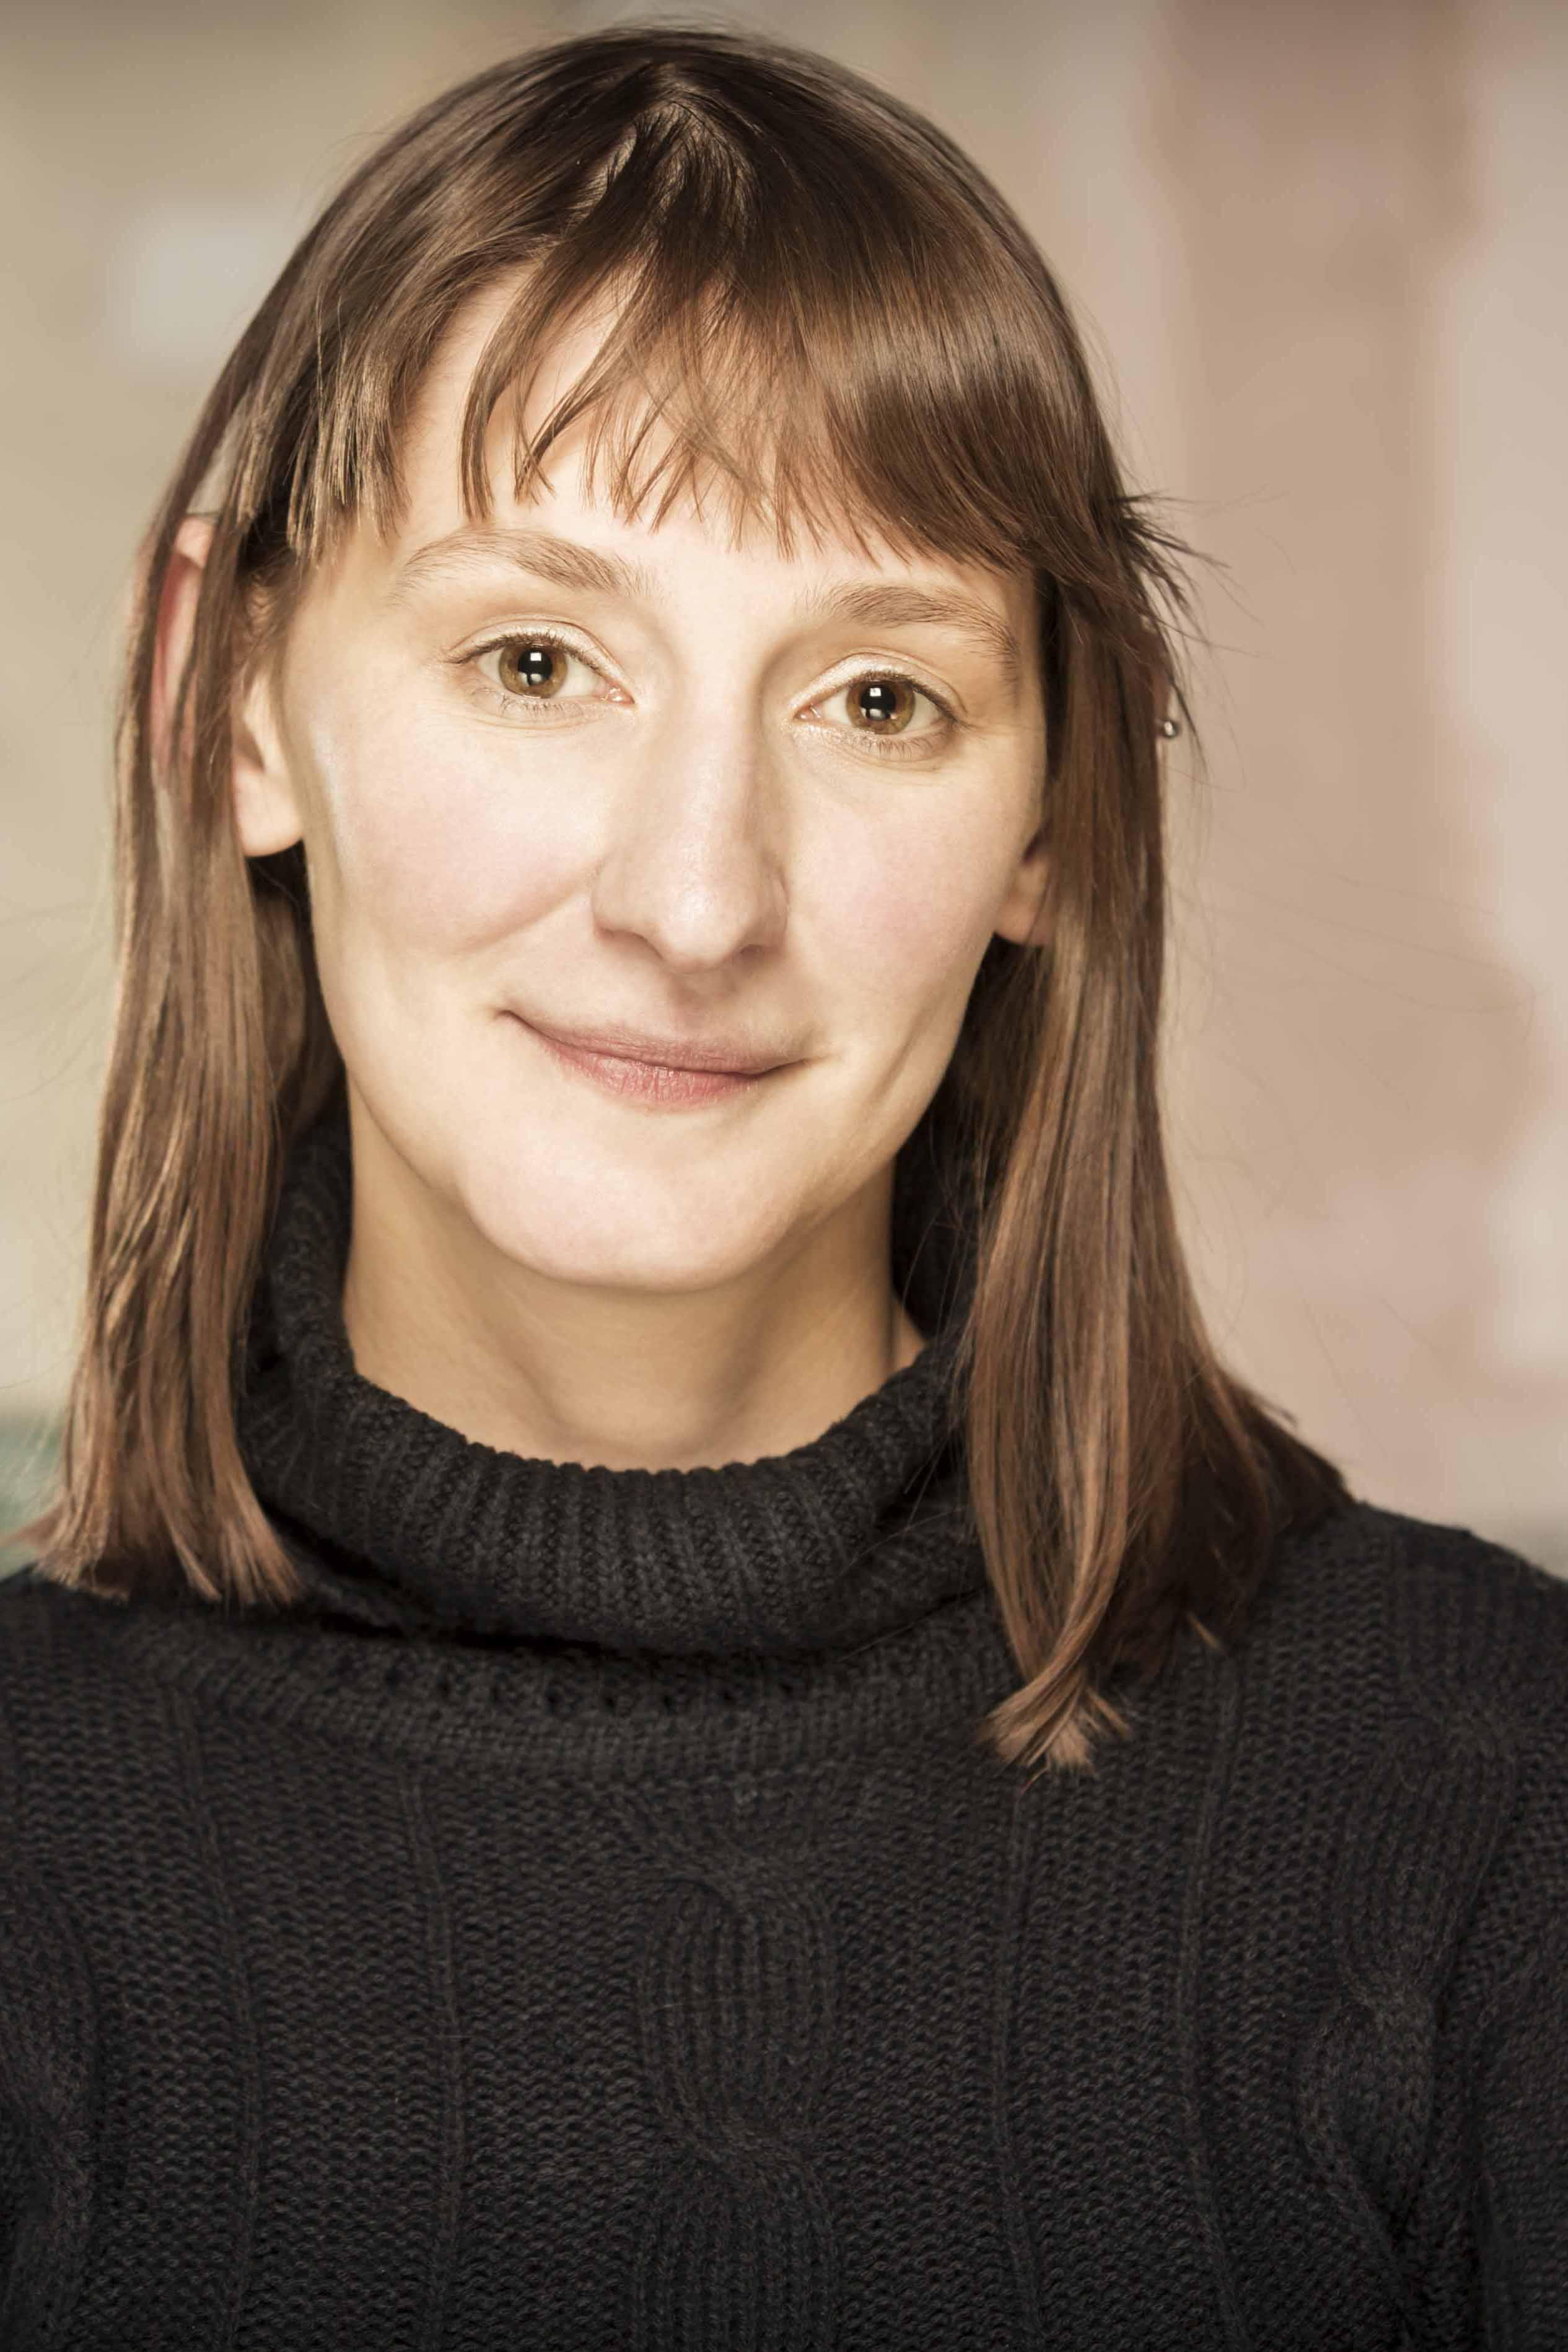 Laura Elphinstone